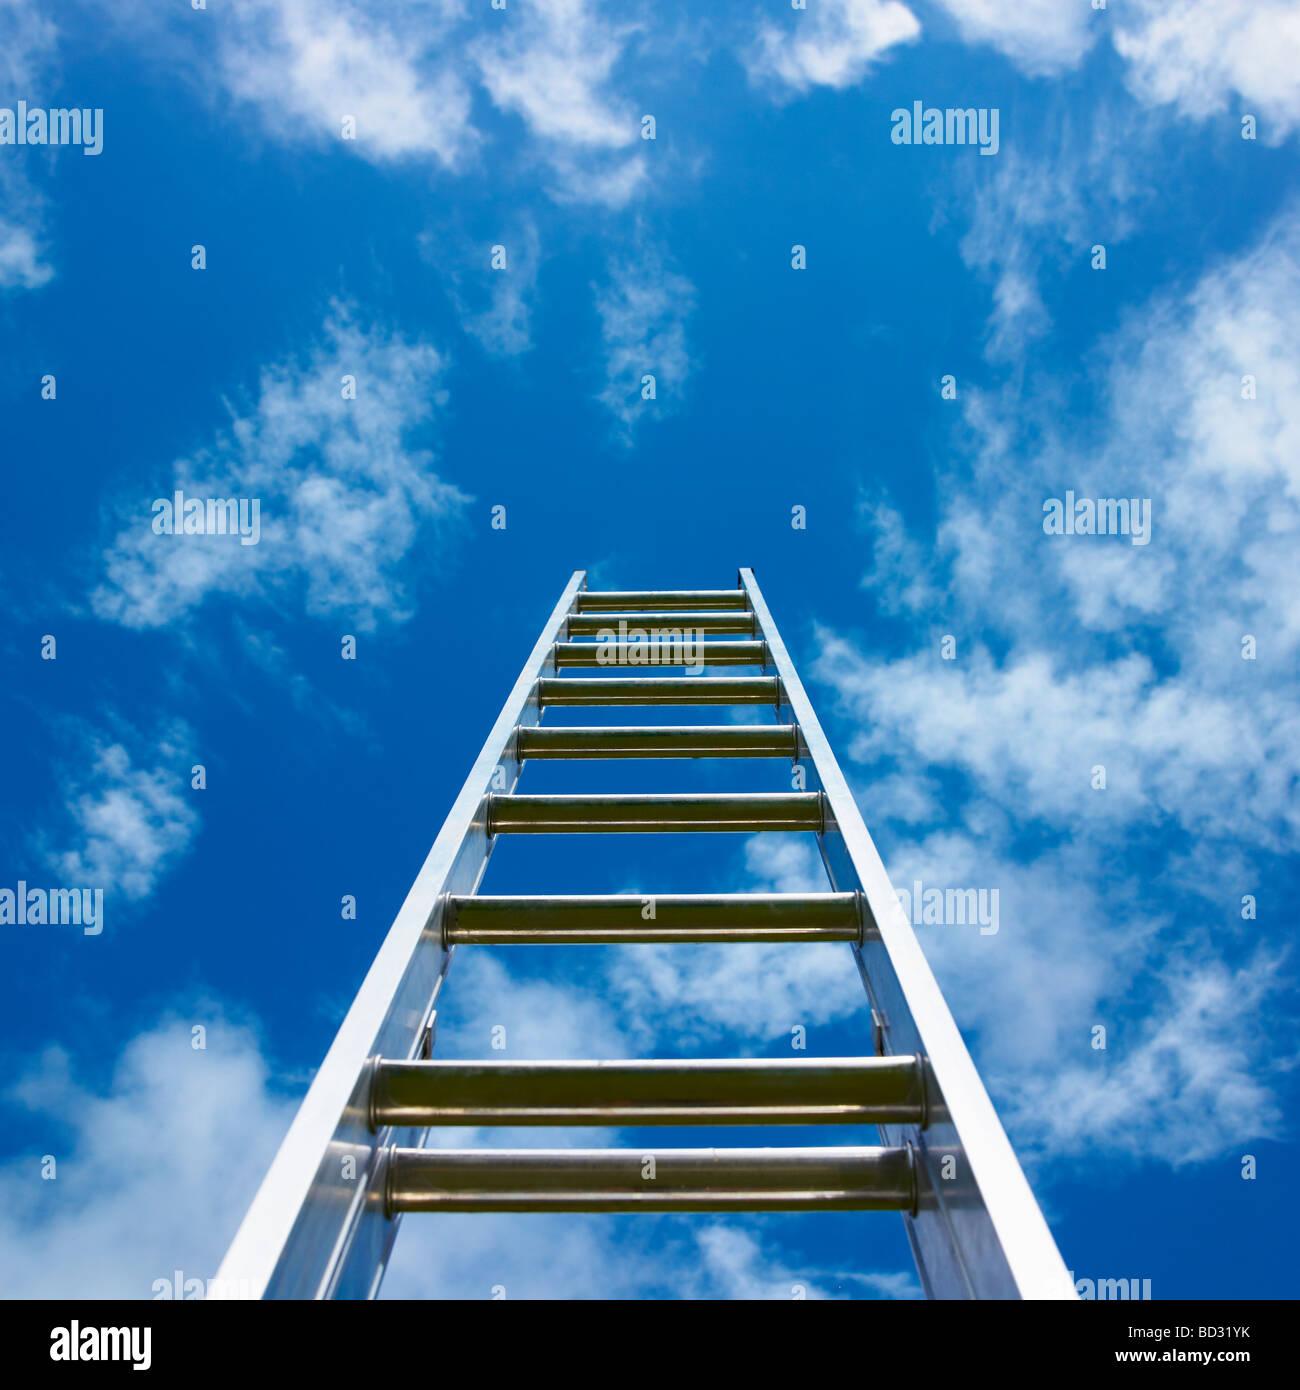 Ladder against blue sky. - Stock Image